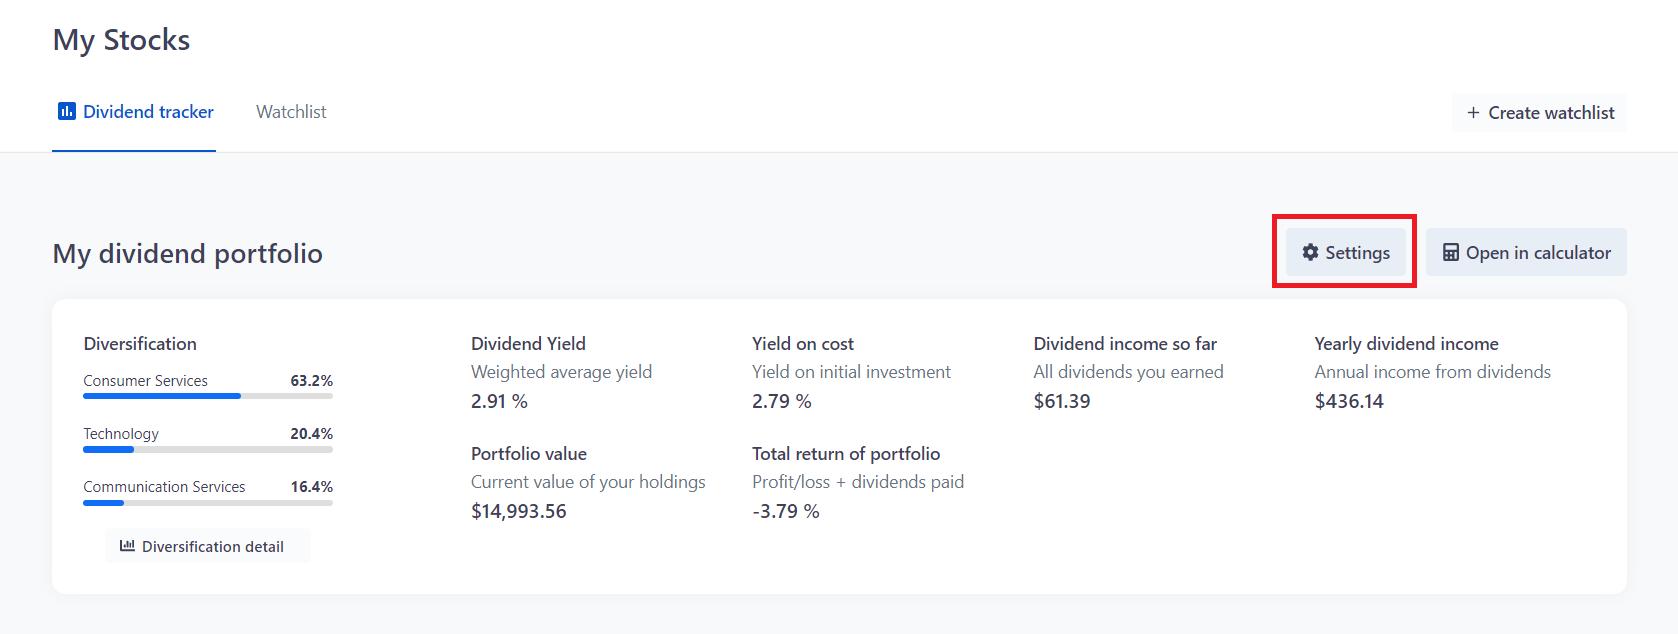 Dividend portfolio - Settings button